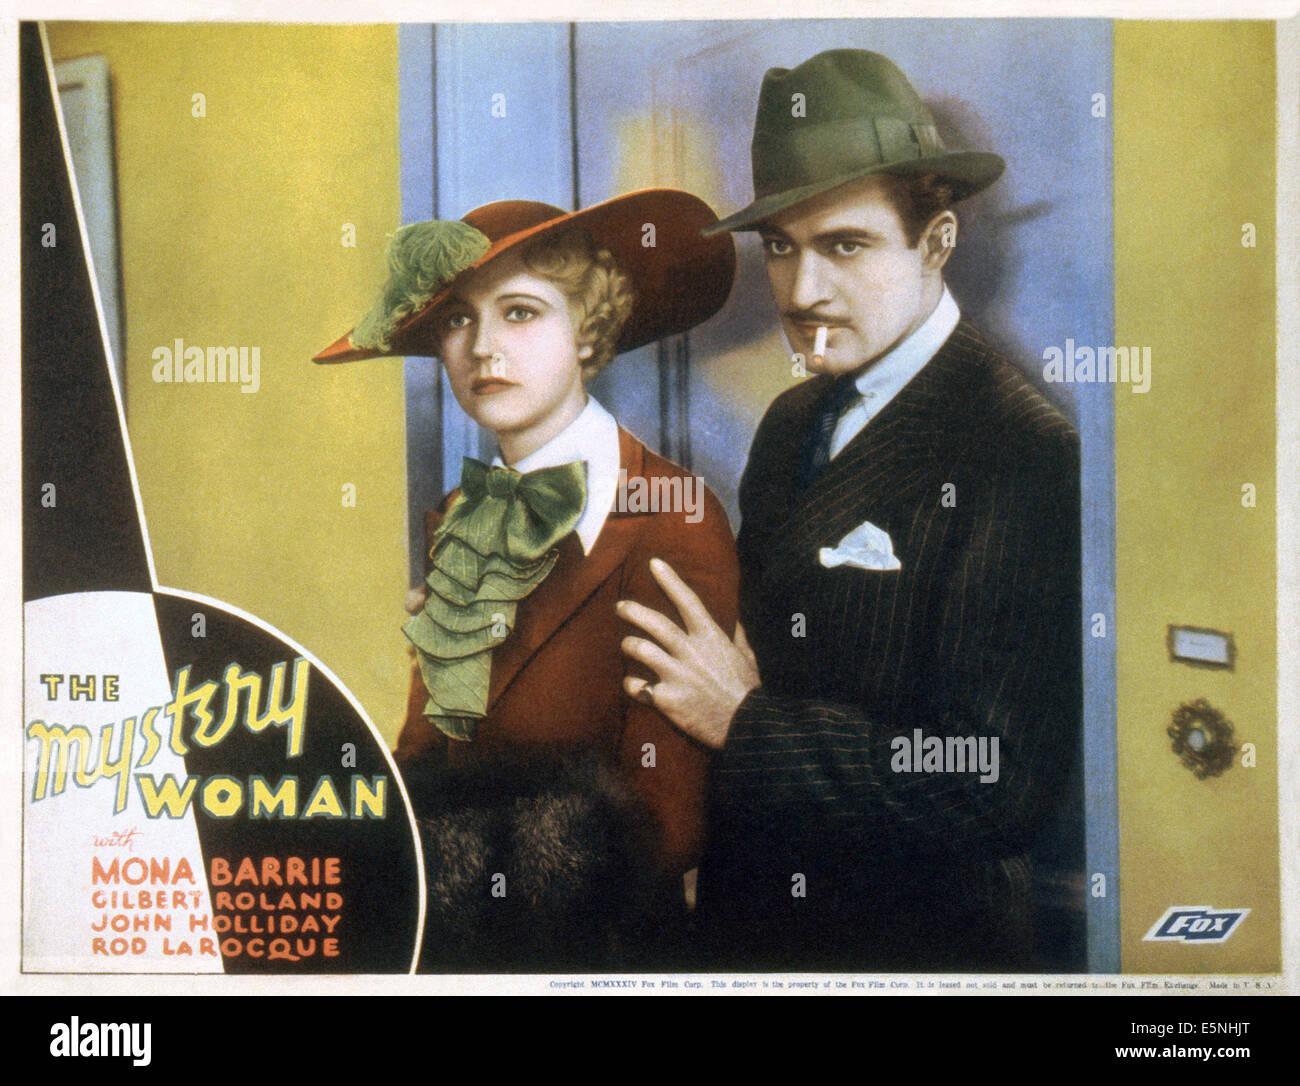 MYSTERY WOMAN, US lobbycard, Mona Barrie, Gilbert Roland, 1935. ©Fox Film Corporation/courtesy Everett Collection - Stock Image